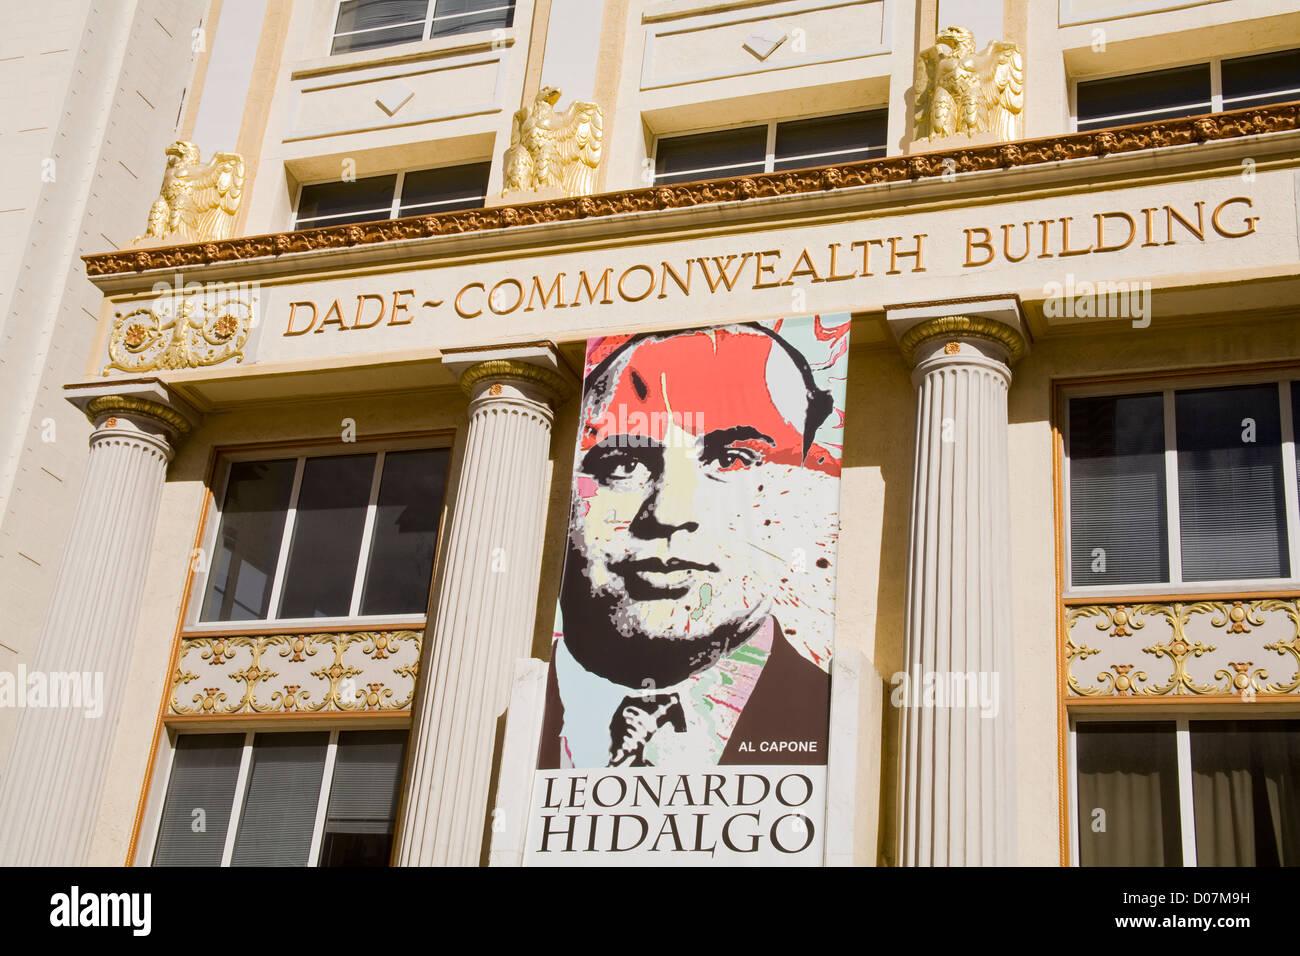 Dade-Commonwealth Building,Miami,Florida,USA - Stock Image